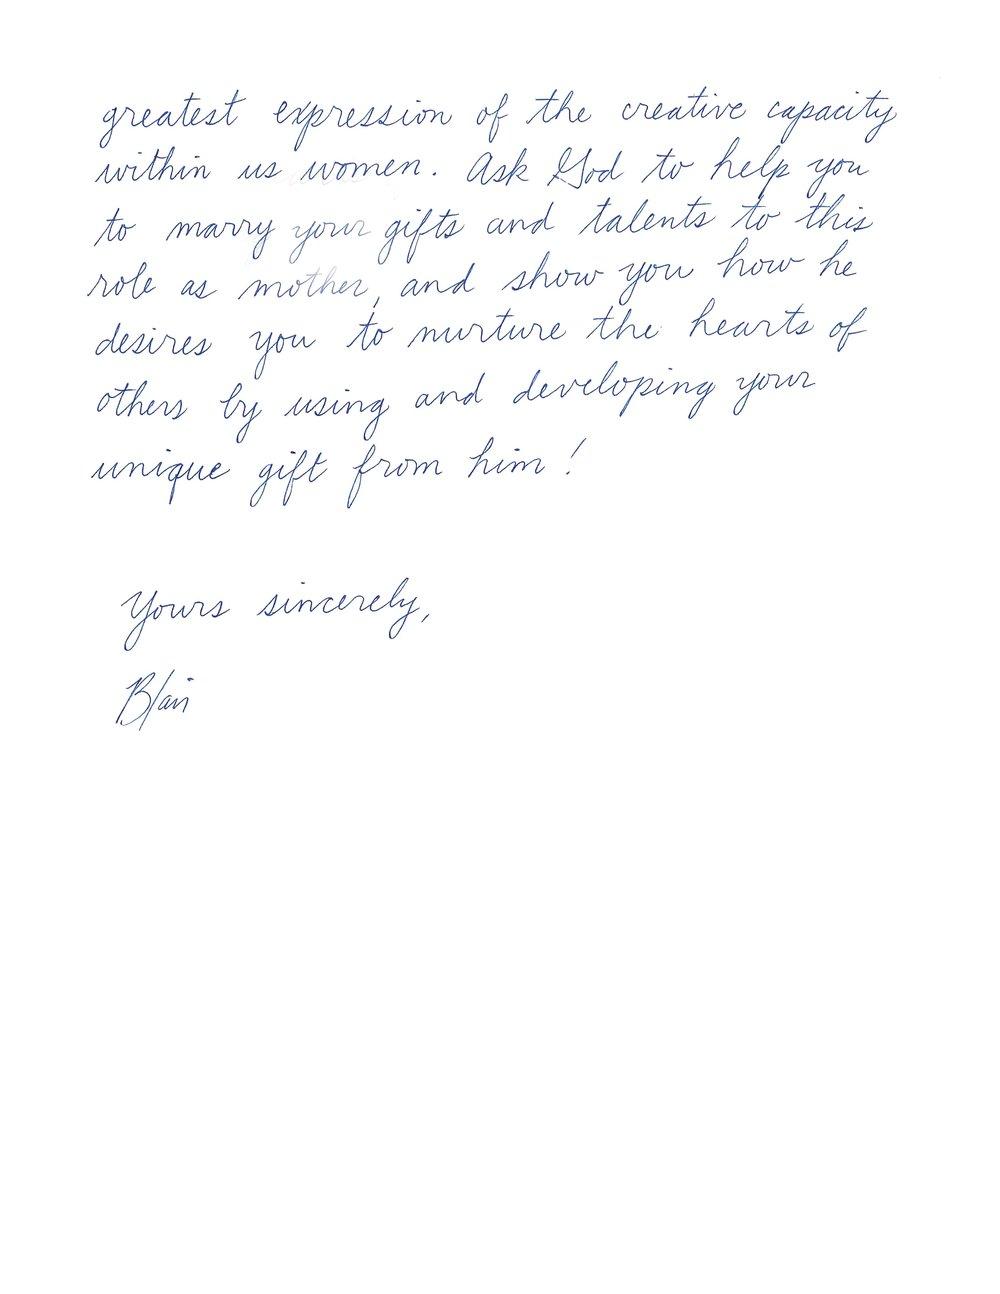 Handwritten Letter to Women final7.jpg